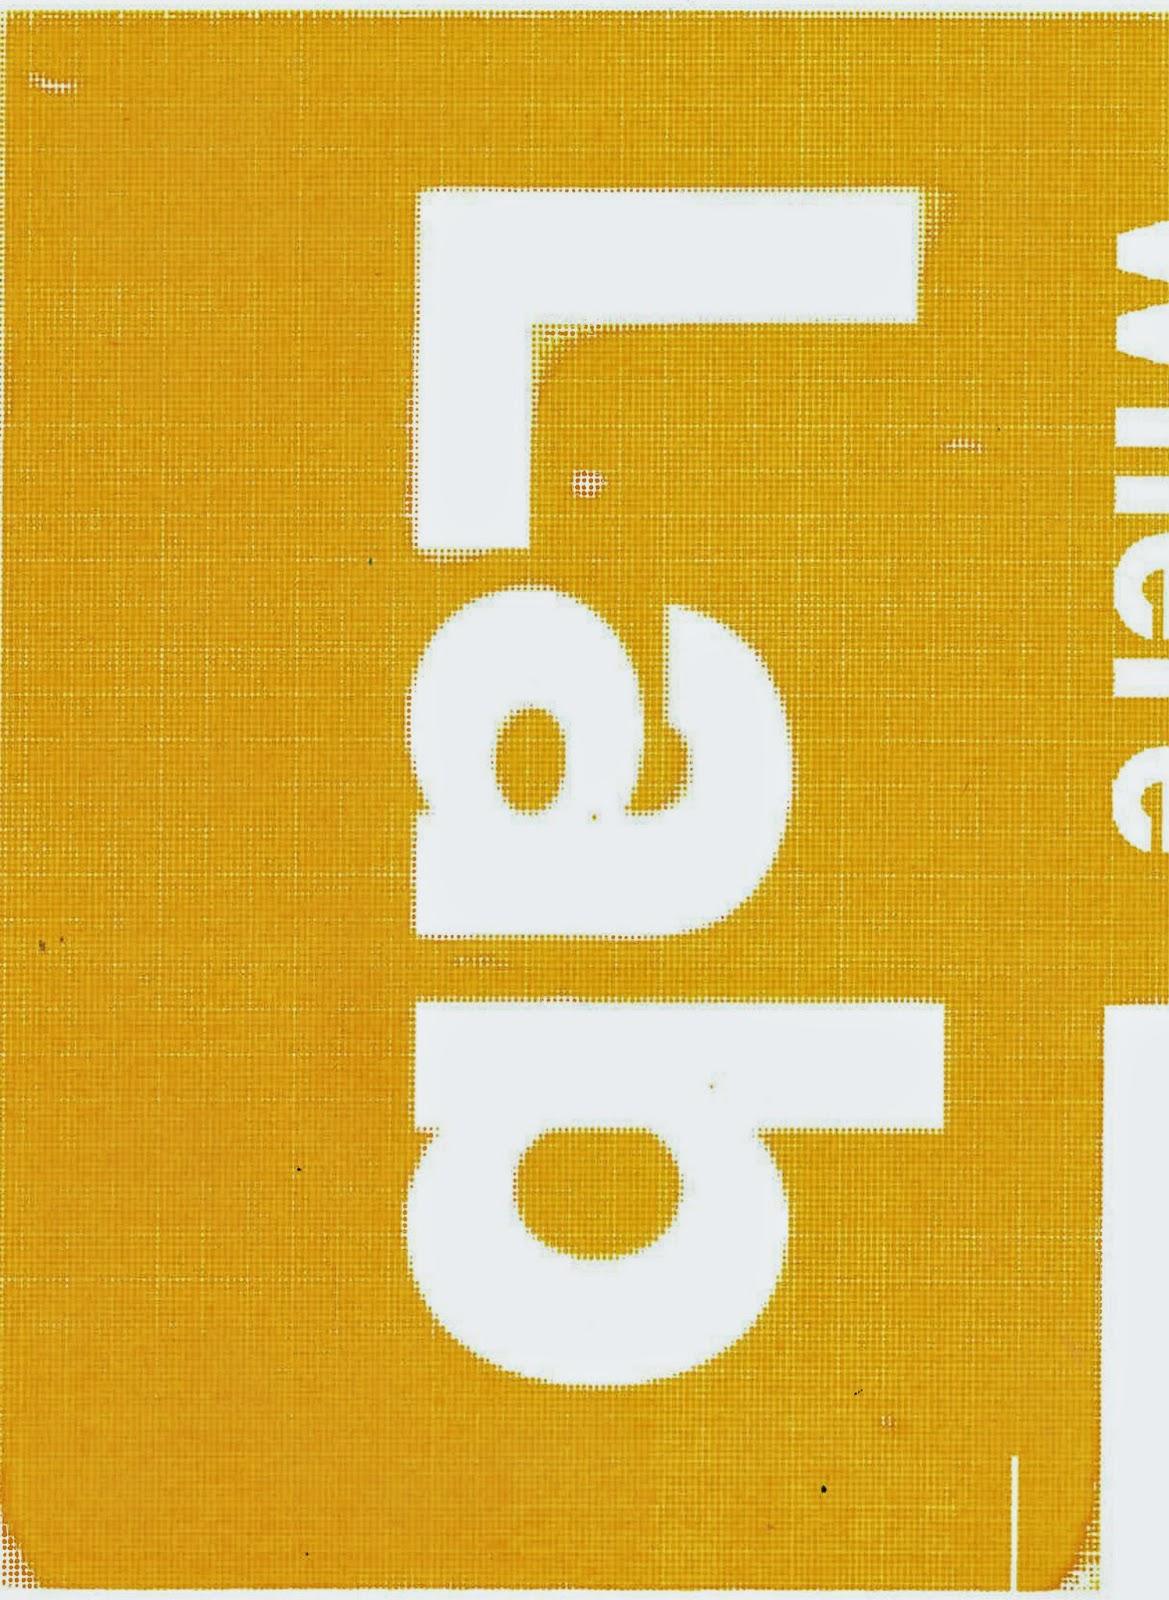 http://rfacdn.nz/artgallery/assets/media/blog-the-lab-book.jpg